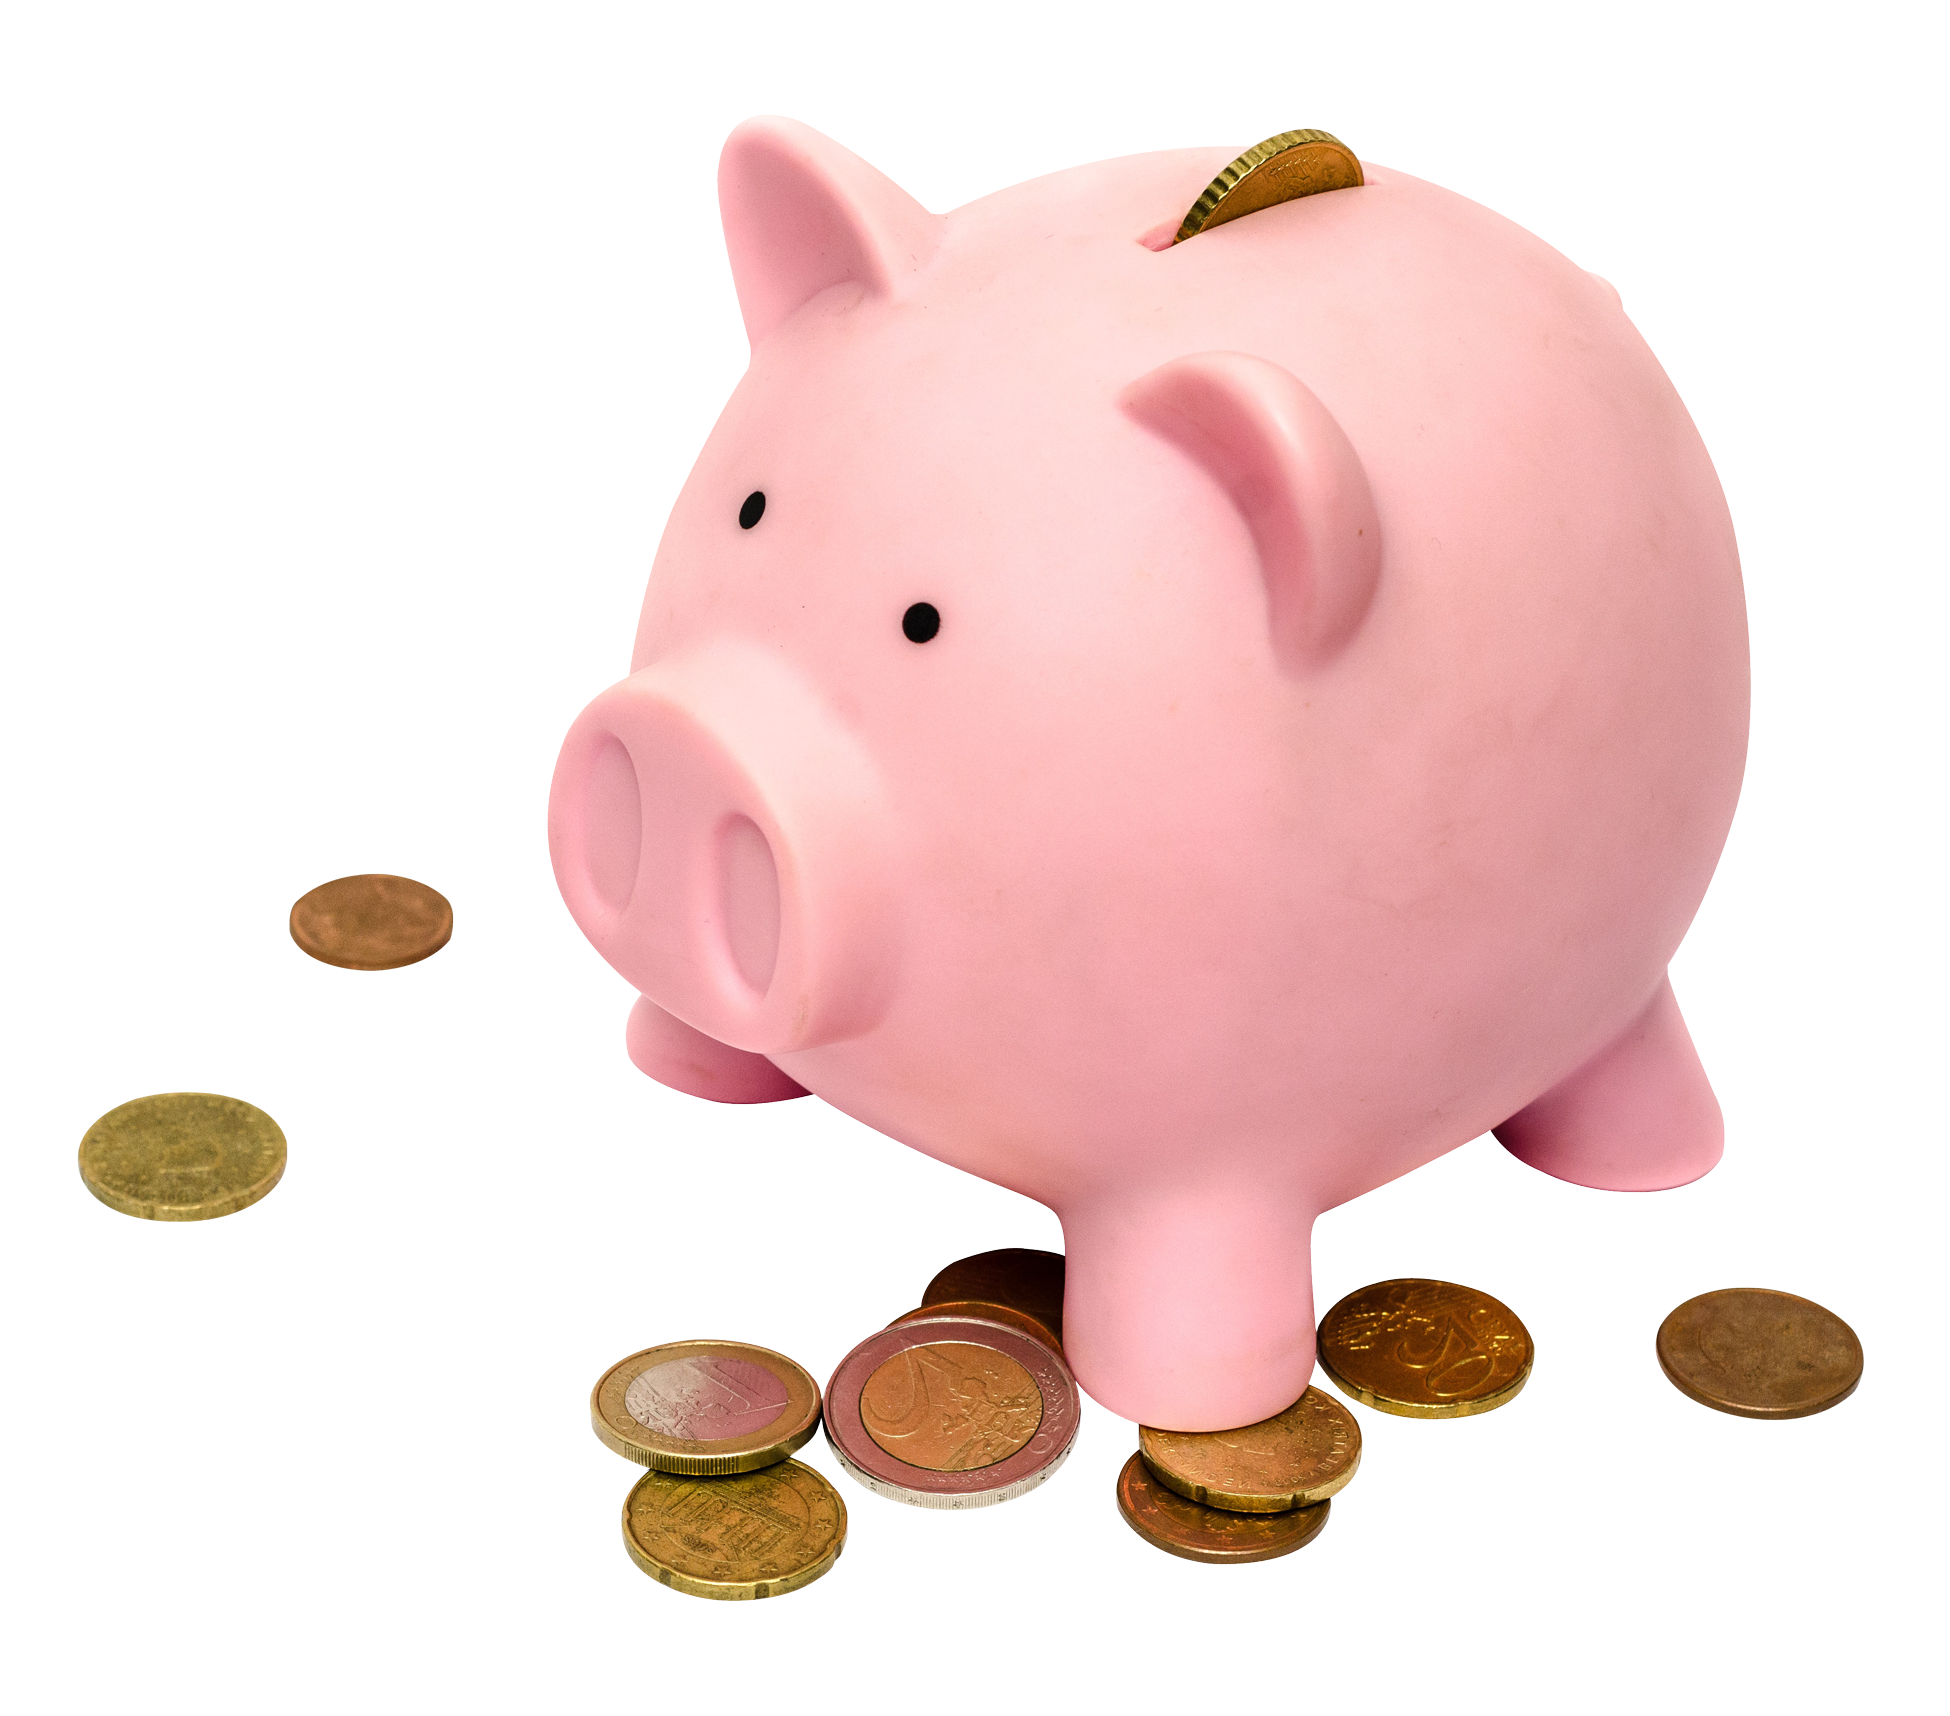 Piggy Bank Png Image Piggy Bank Piggy Bank